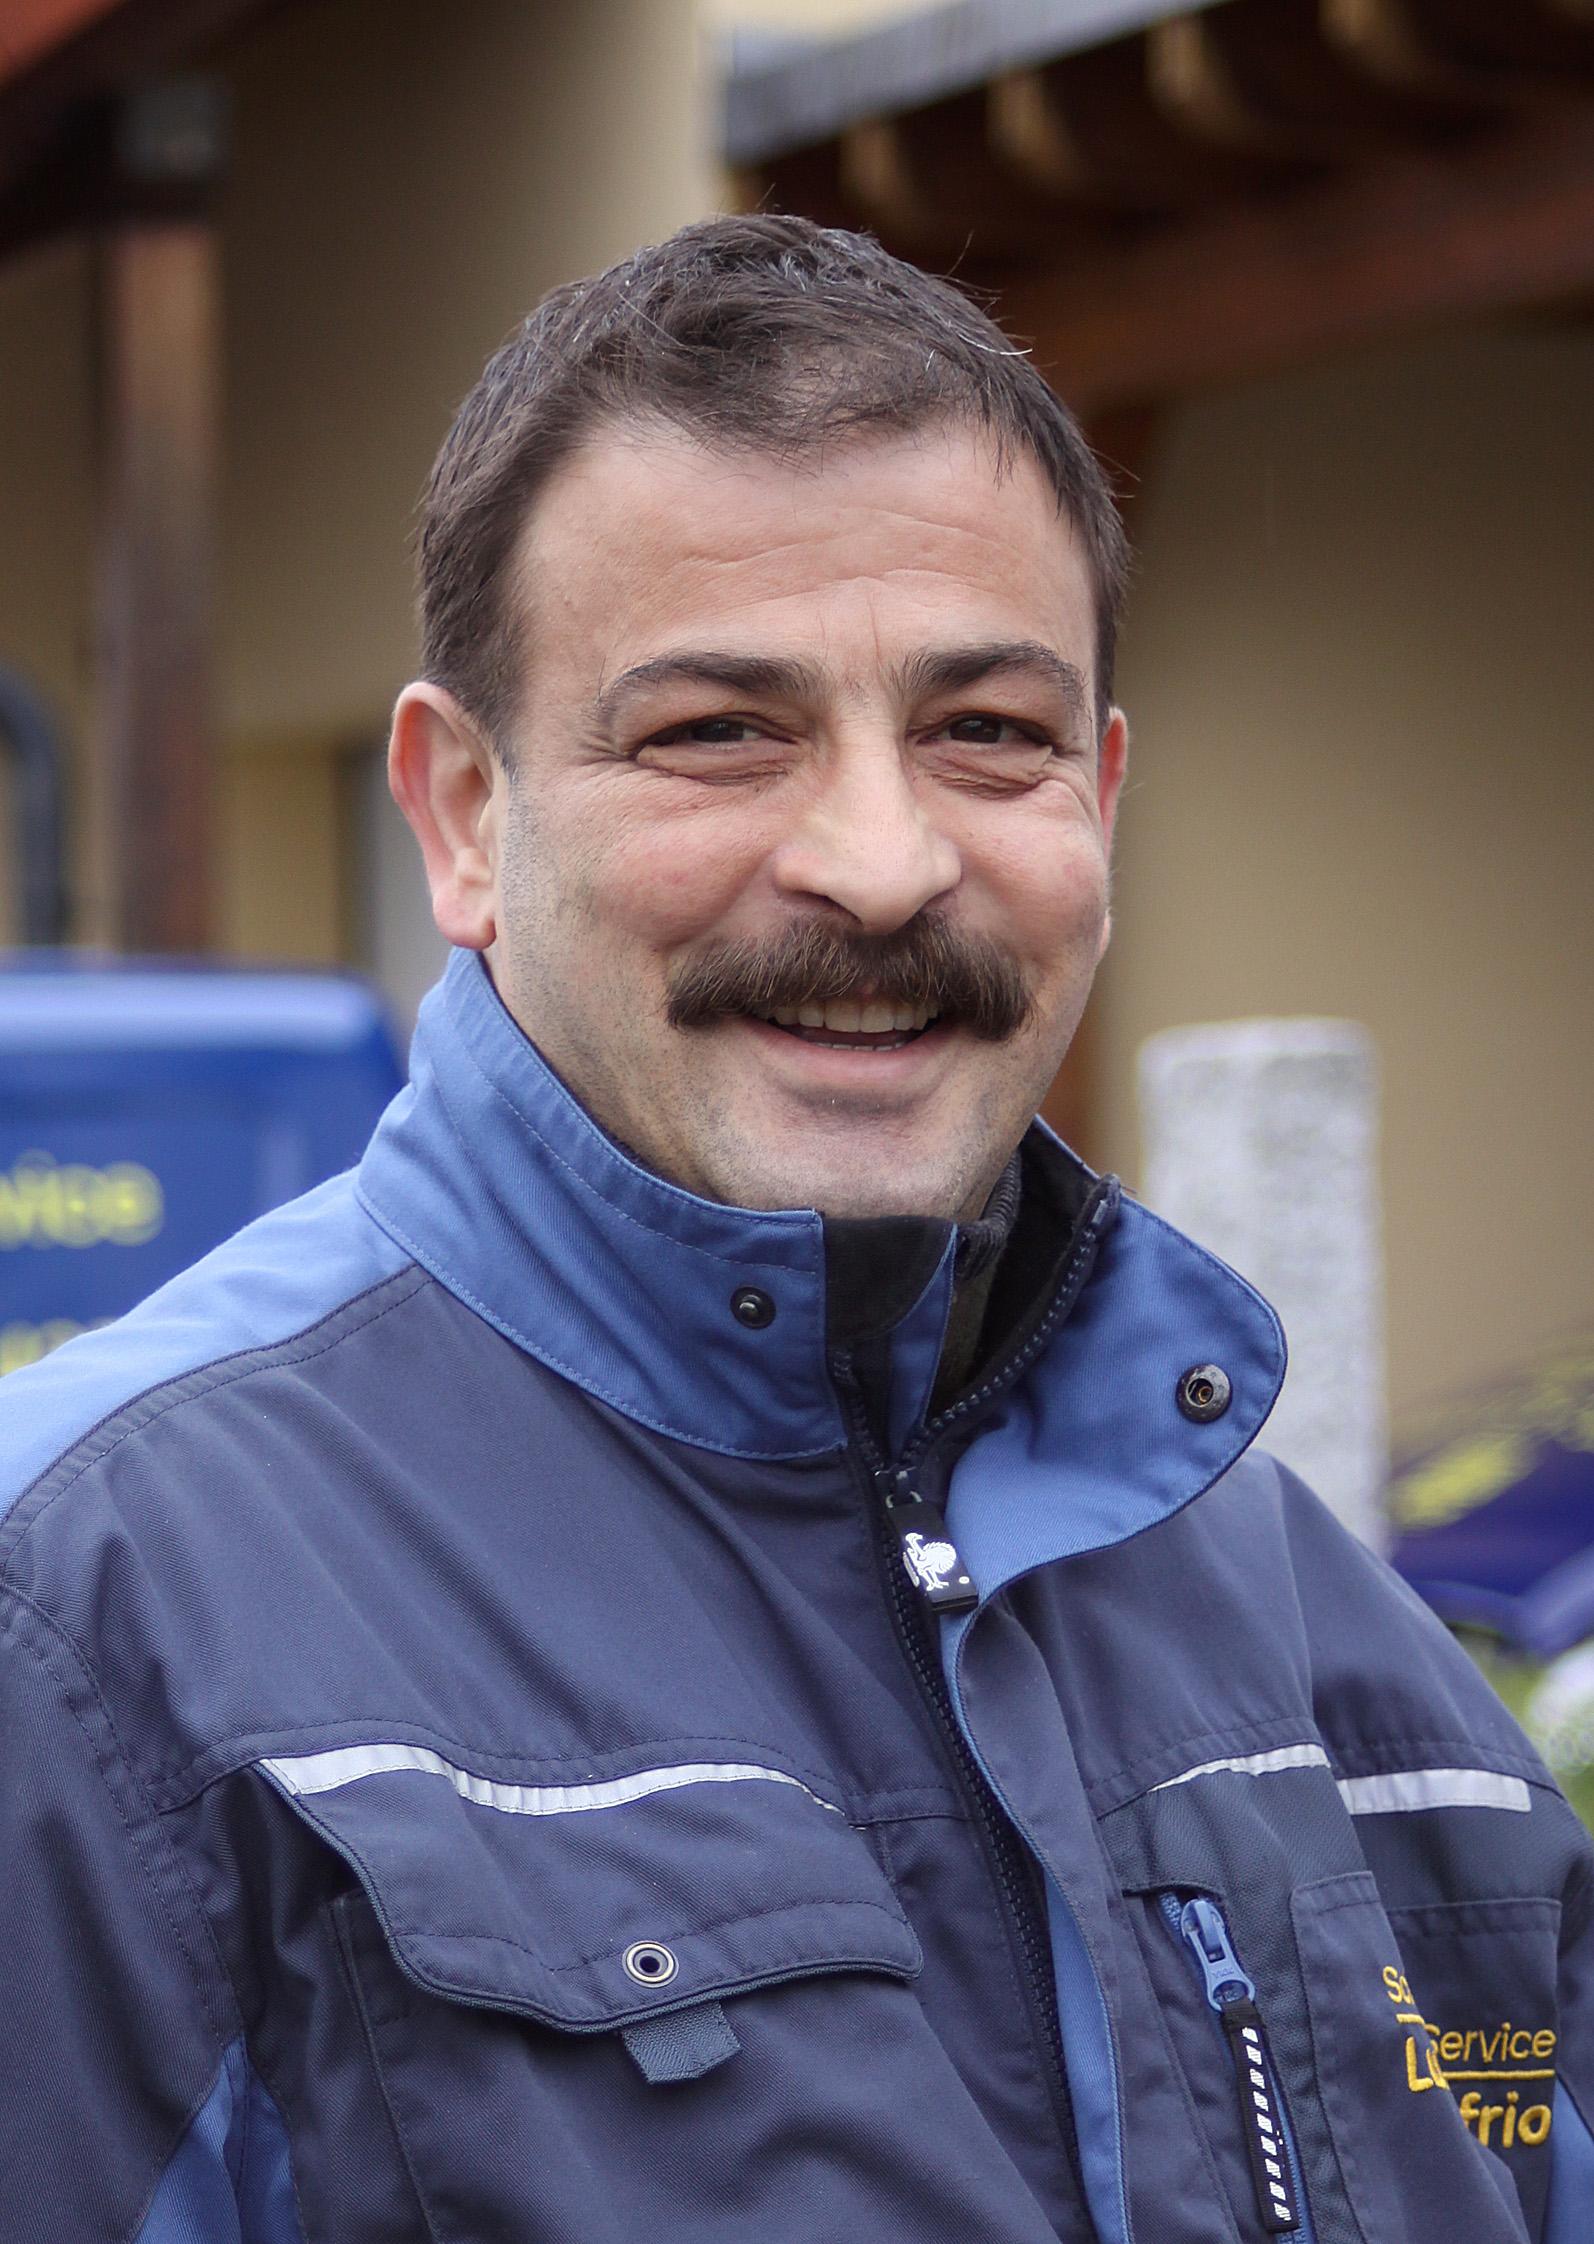 Martino Clarizia, Angestellter